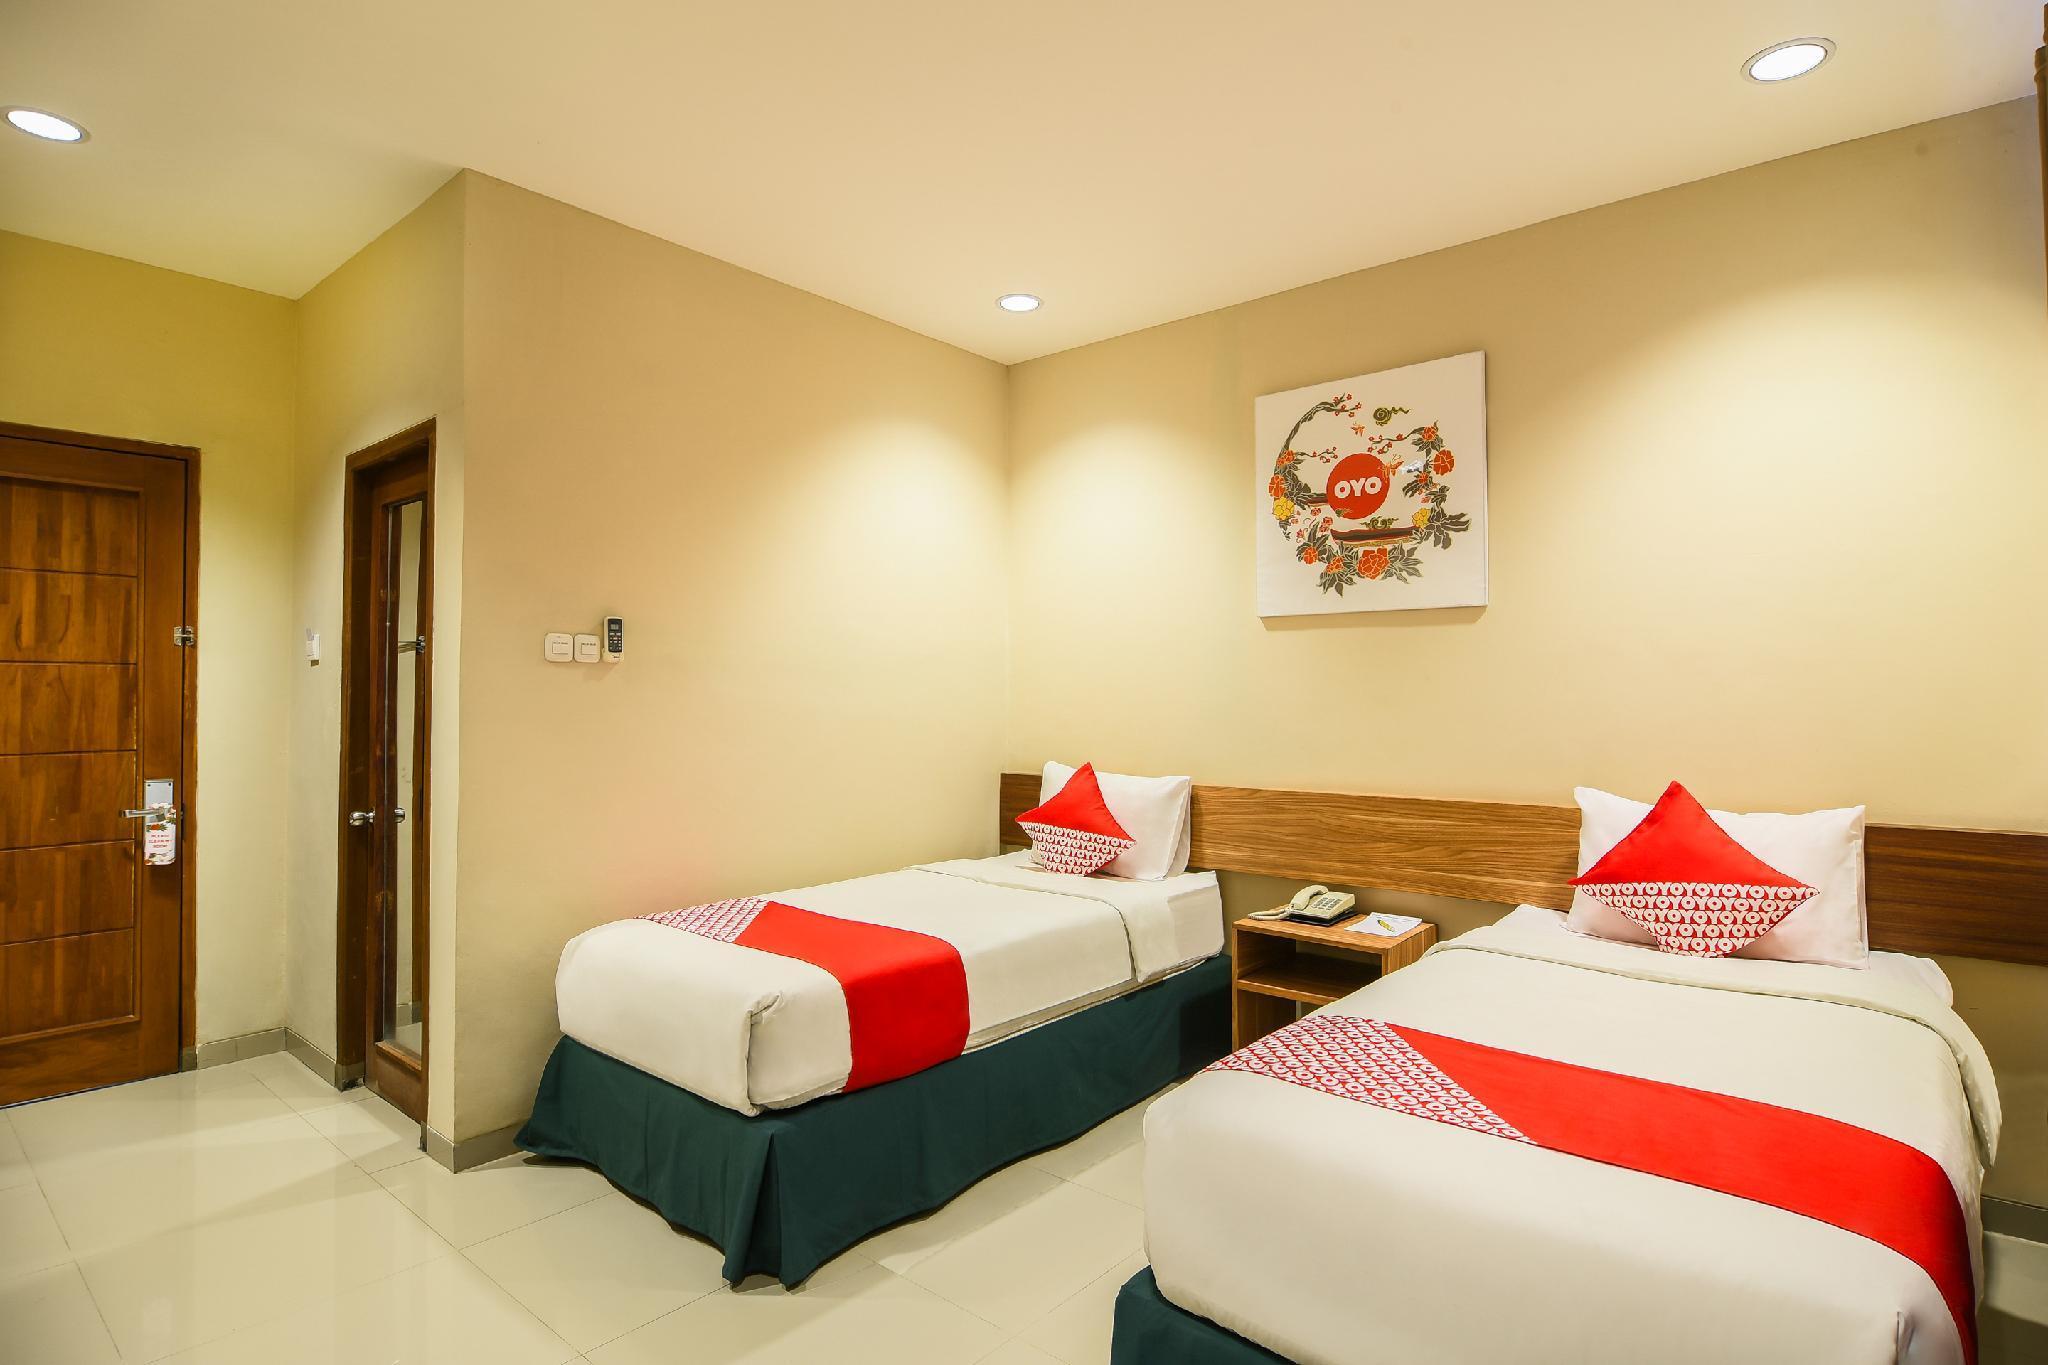 OYO 674 Hotel Cepu Indah 2, Blora